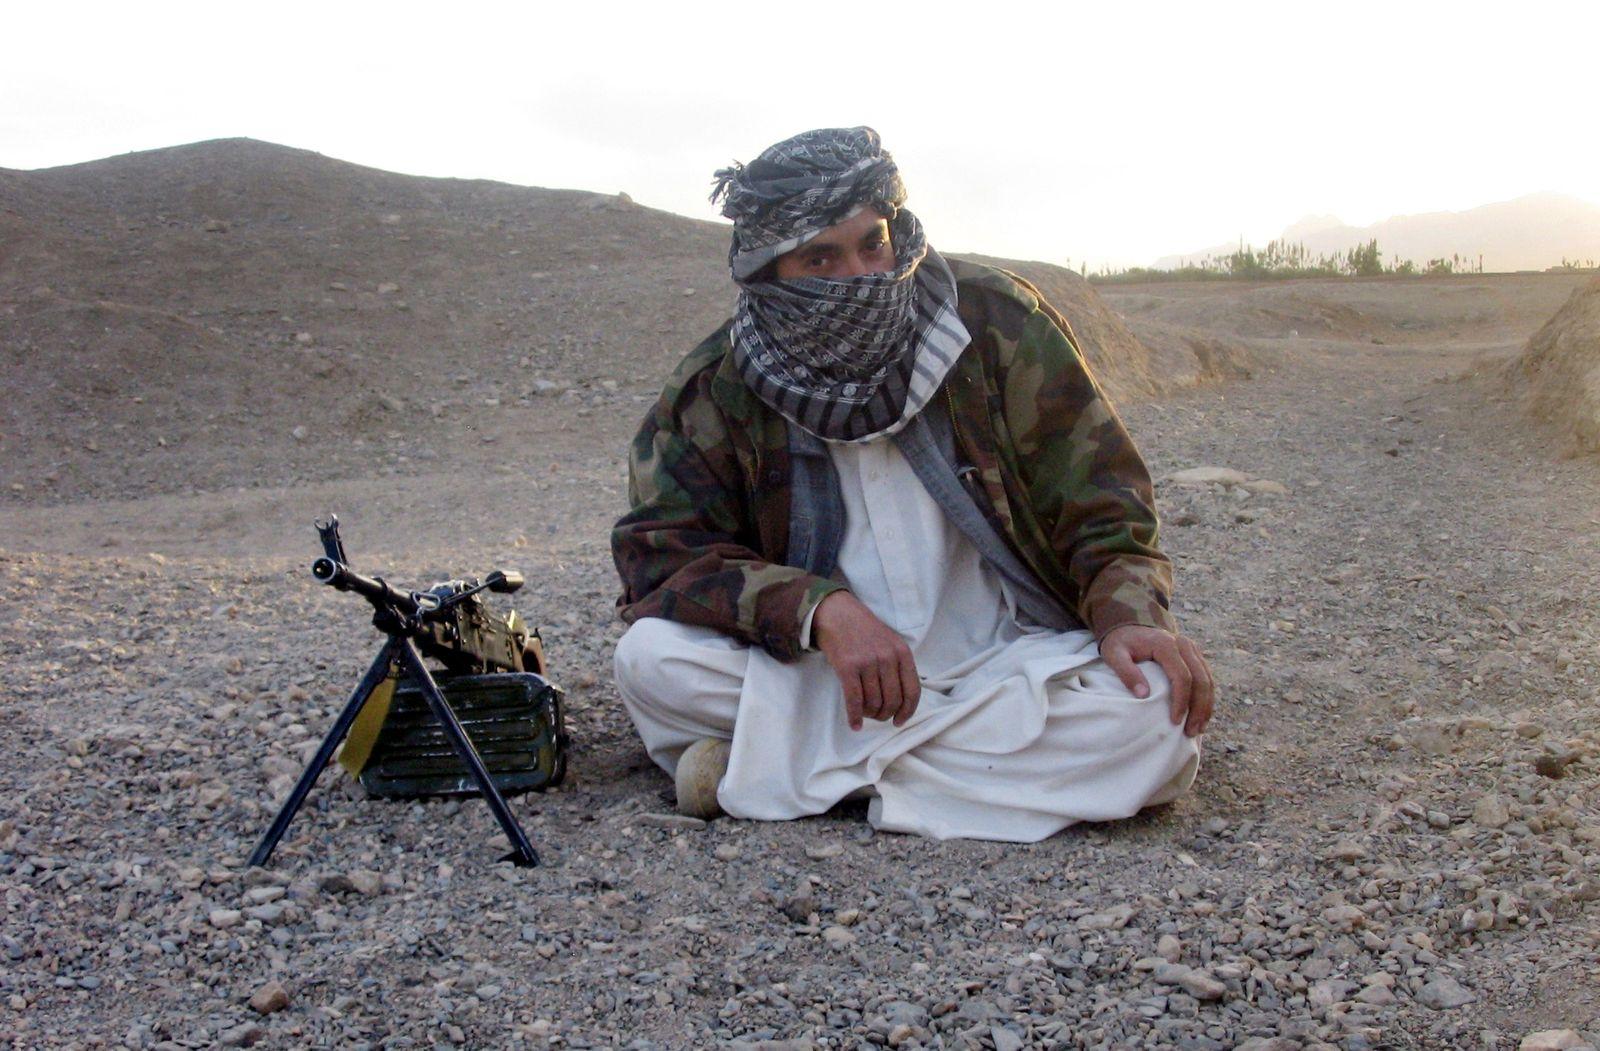 AFGHANISTAN-UNREST-TALIBAN-US-NATO-FILES